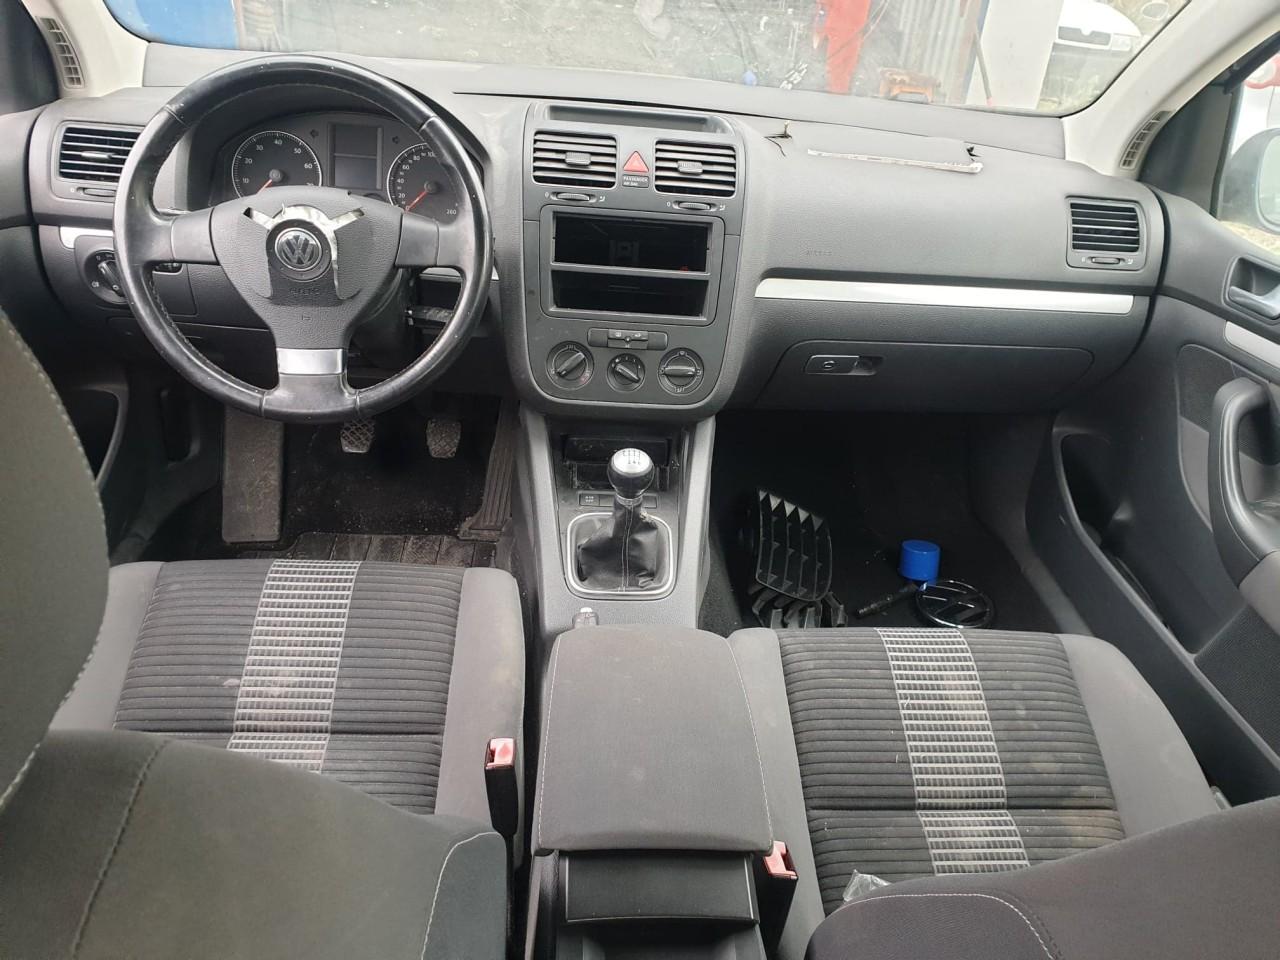 Dezmembrez VW Golf 5 1.4 TSi 122 cai motor CAXA 6 trepte an 2008